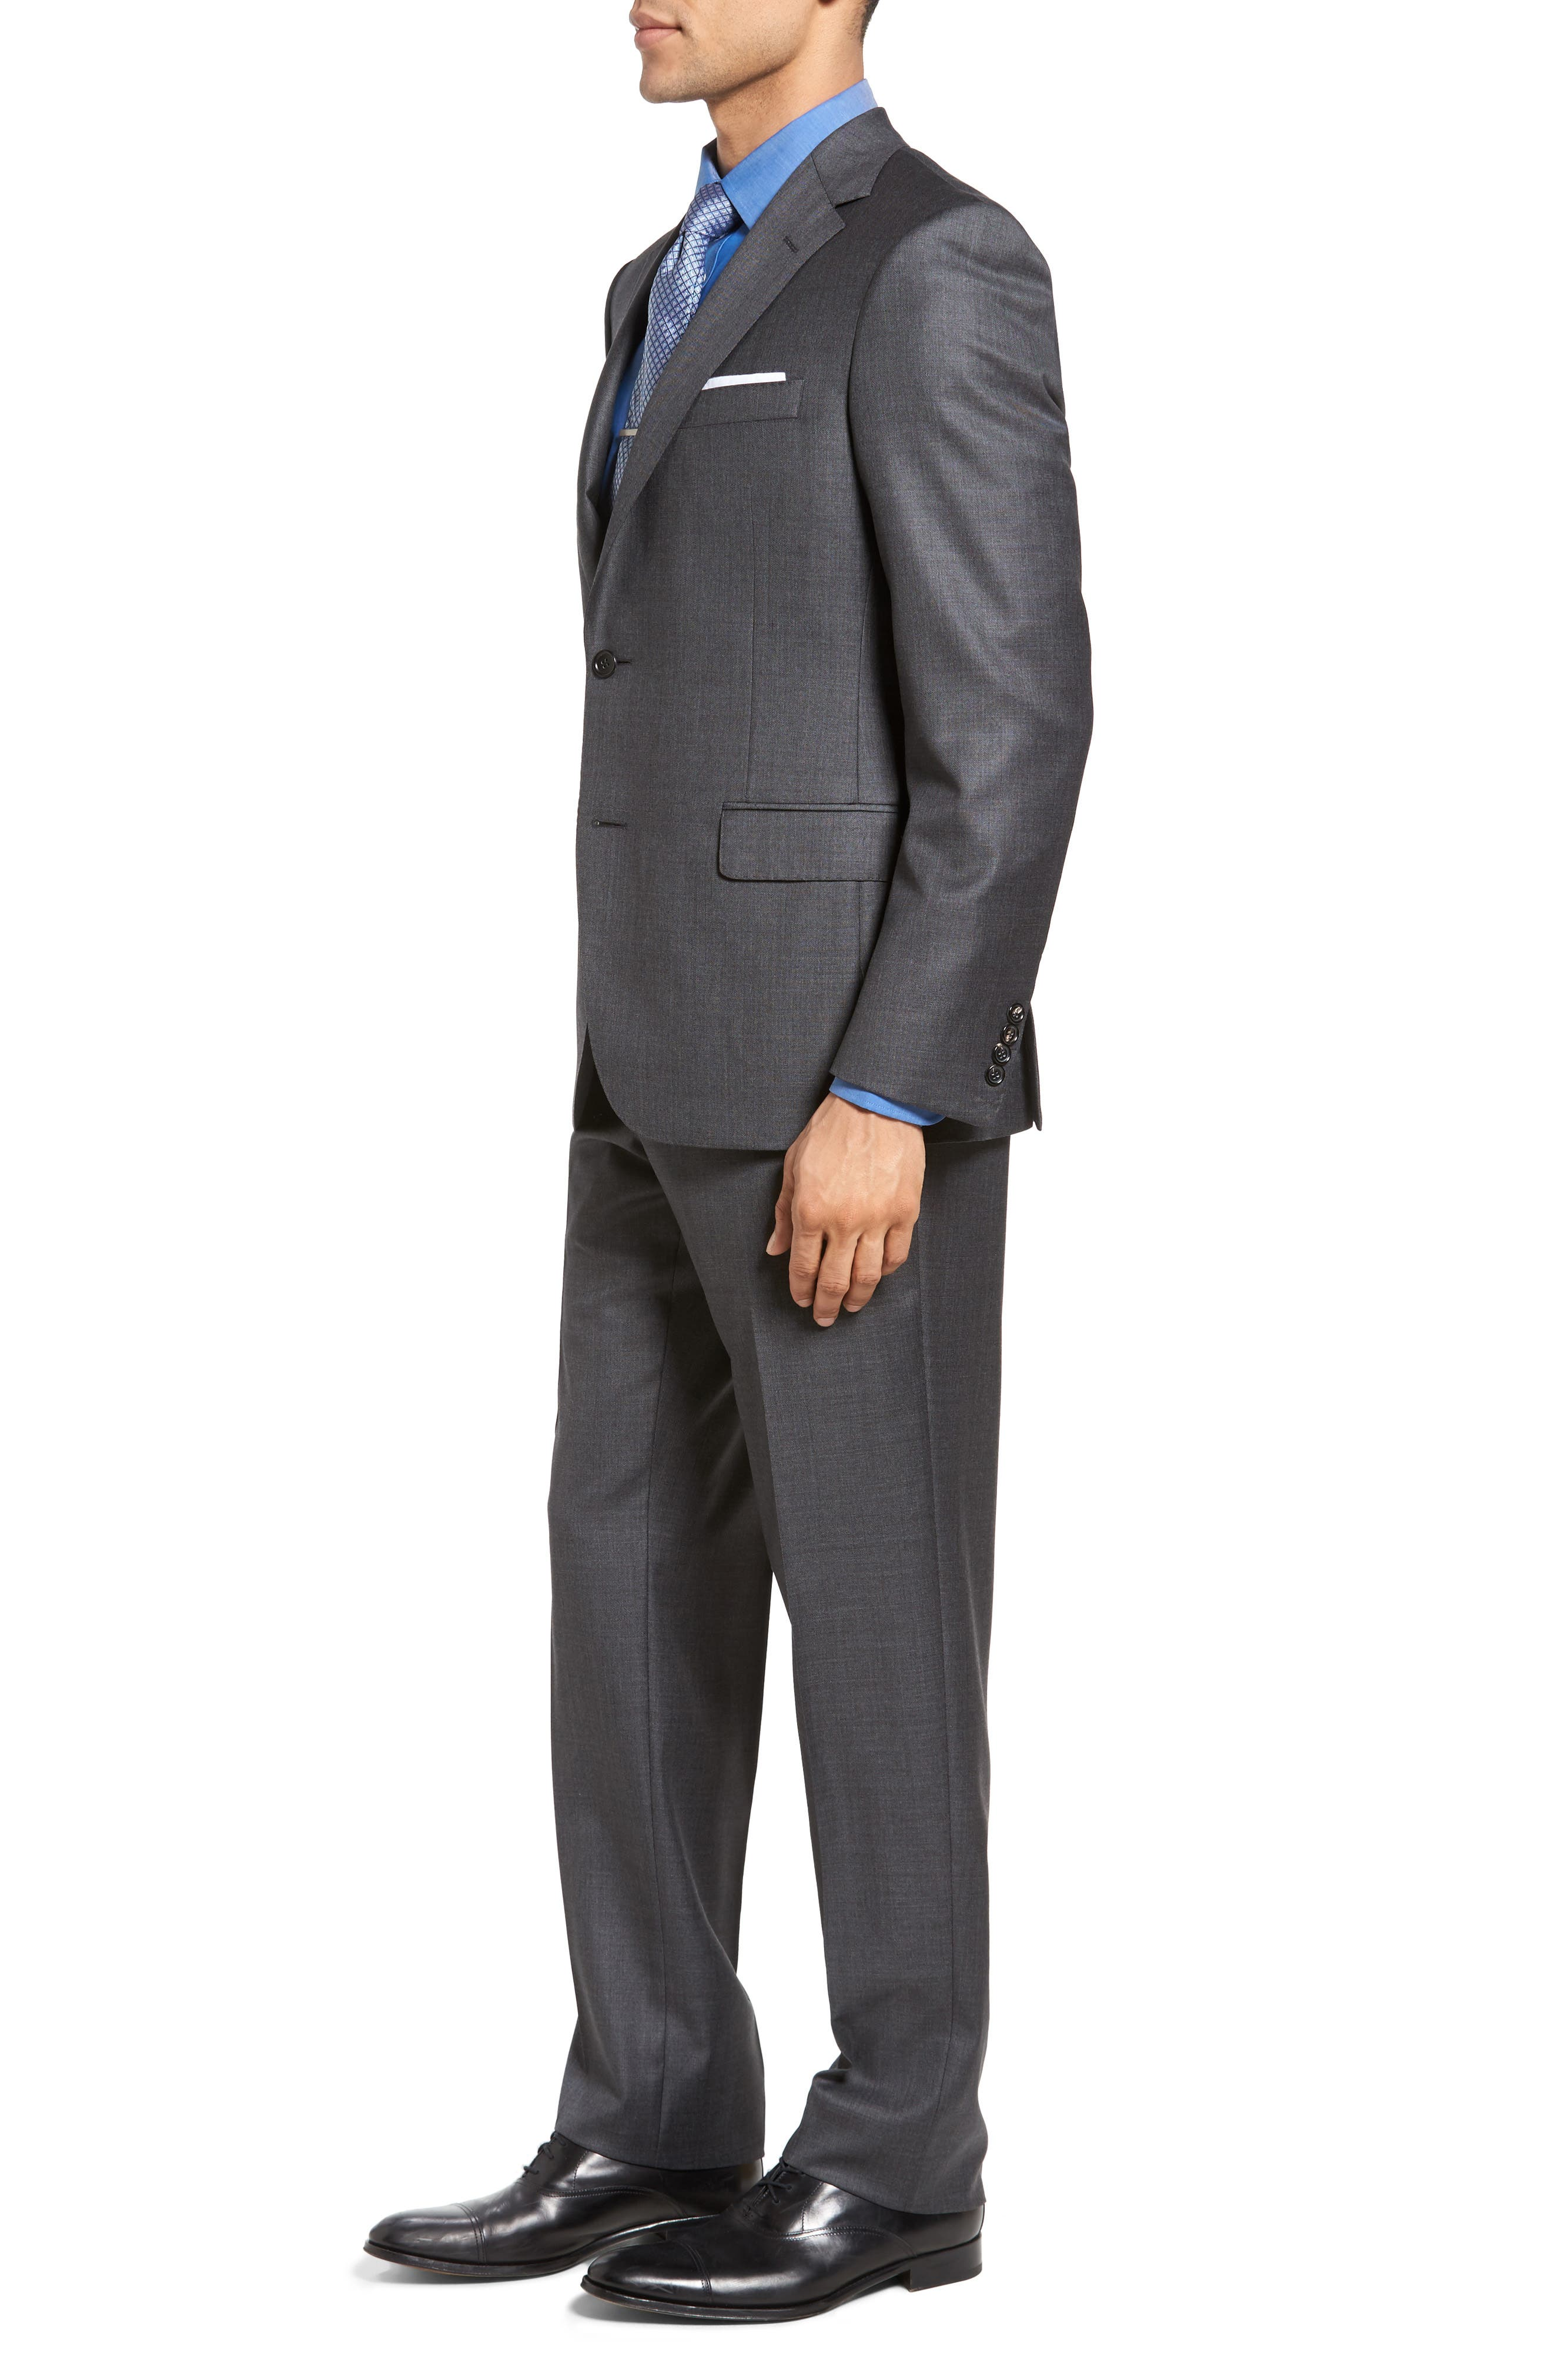 SAMUELSOHN,                             Beckett Classic Fit Sharkskin Wool Suit,                             Alternate thumbnail 3, color,                             020